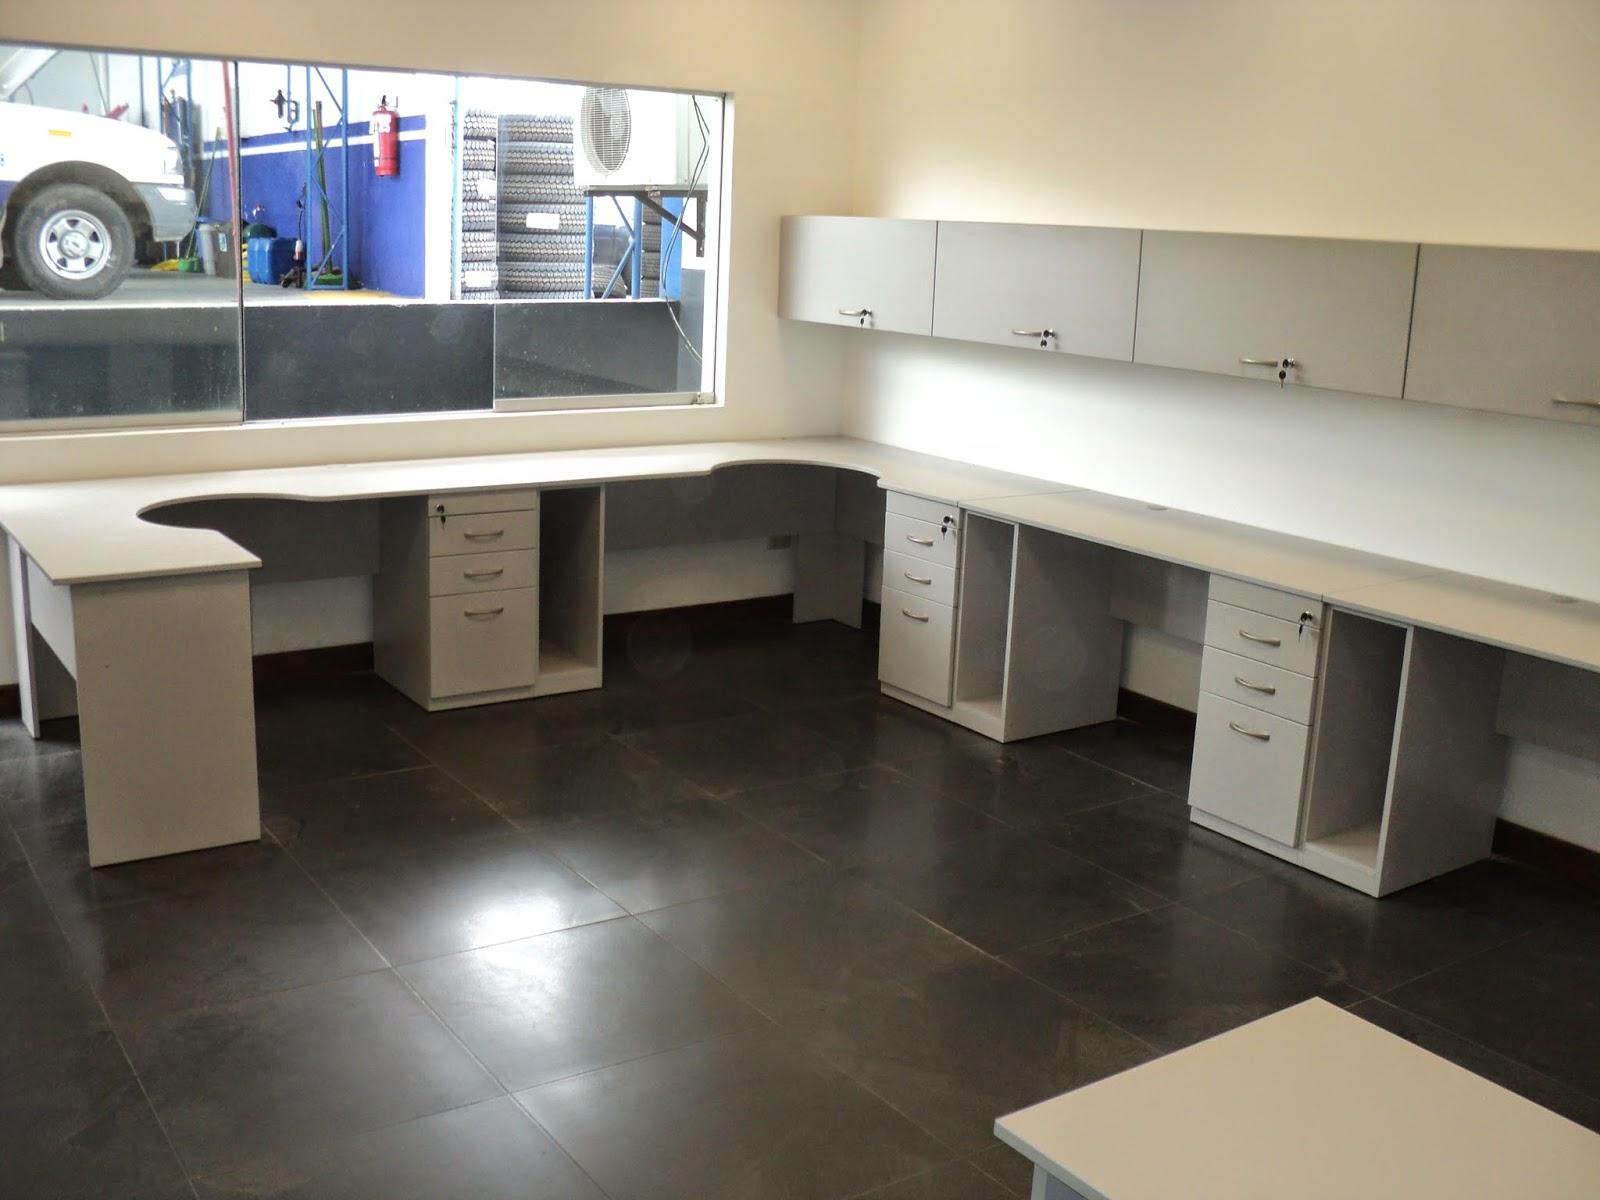 E y g proyectos integrales muebles en melamina aluminio for Programa de diseno de muebles de melamina